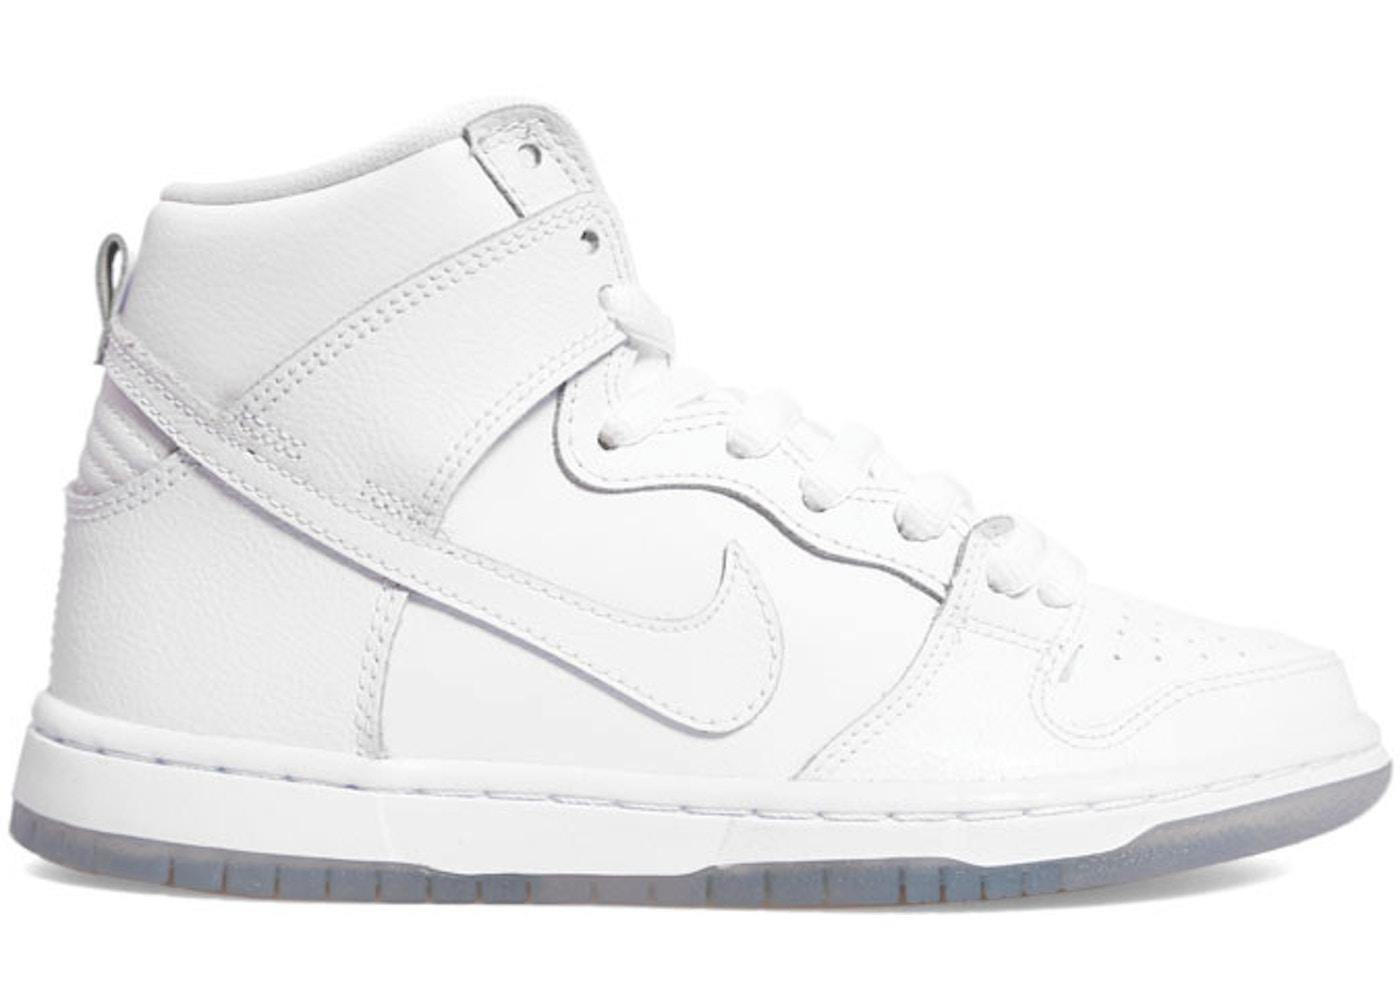 reputable site 6e3cd b1a24 Nike Dunk SB High White Ice